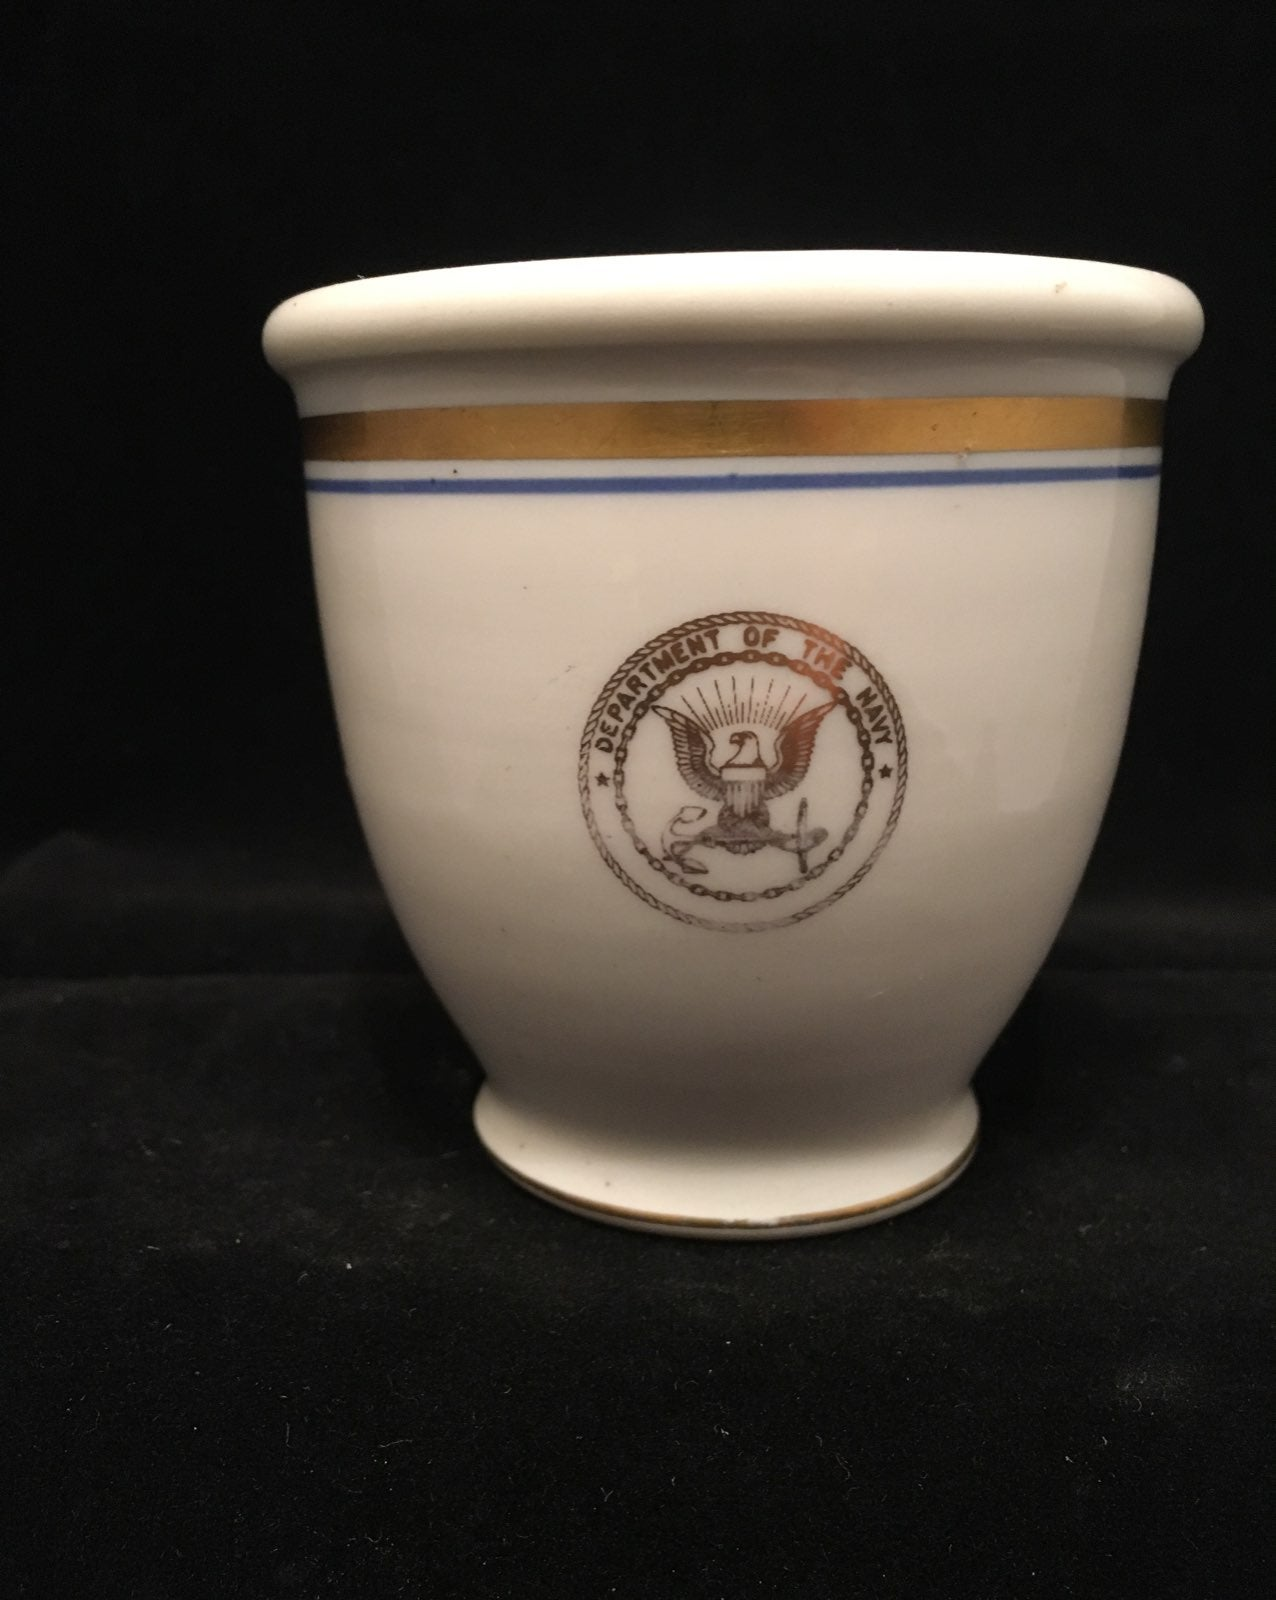 Custard Egg Cup Gold Navy Seal